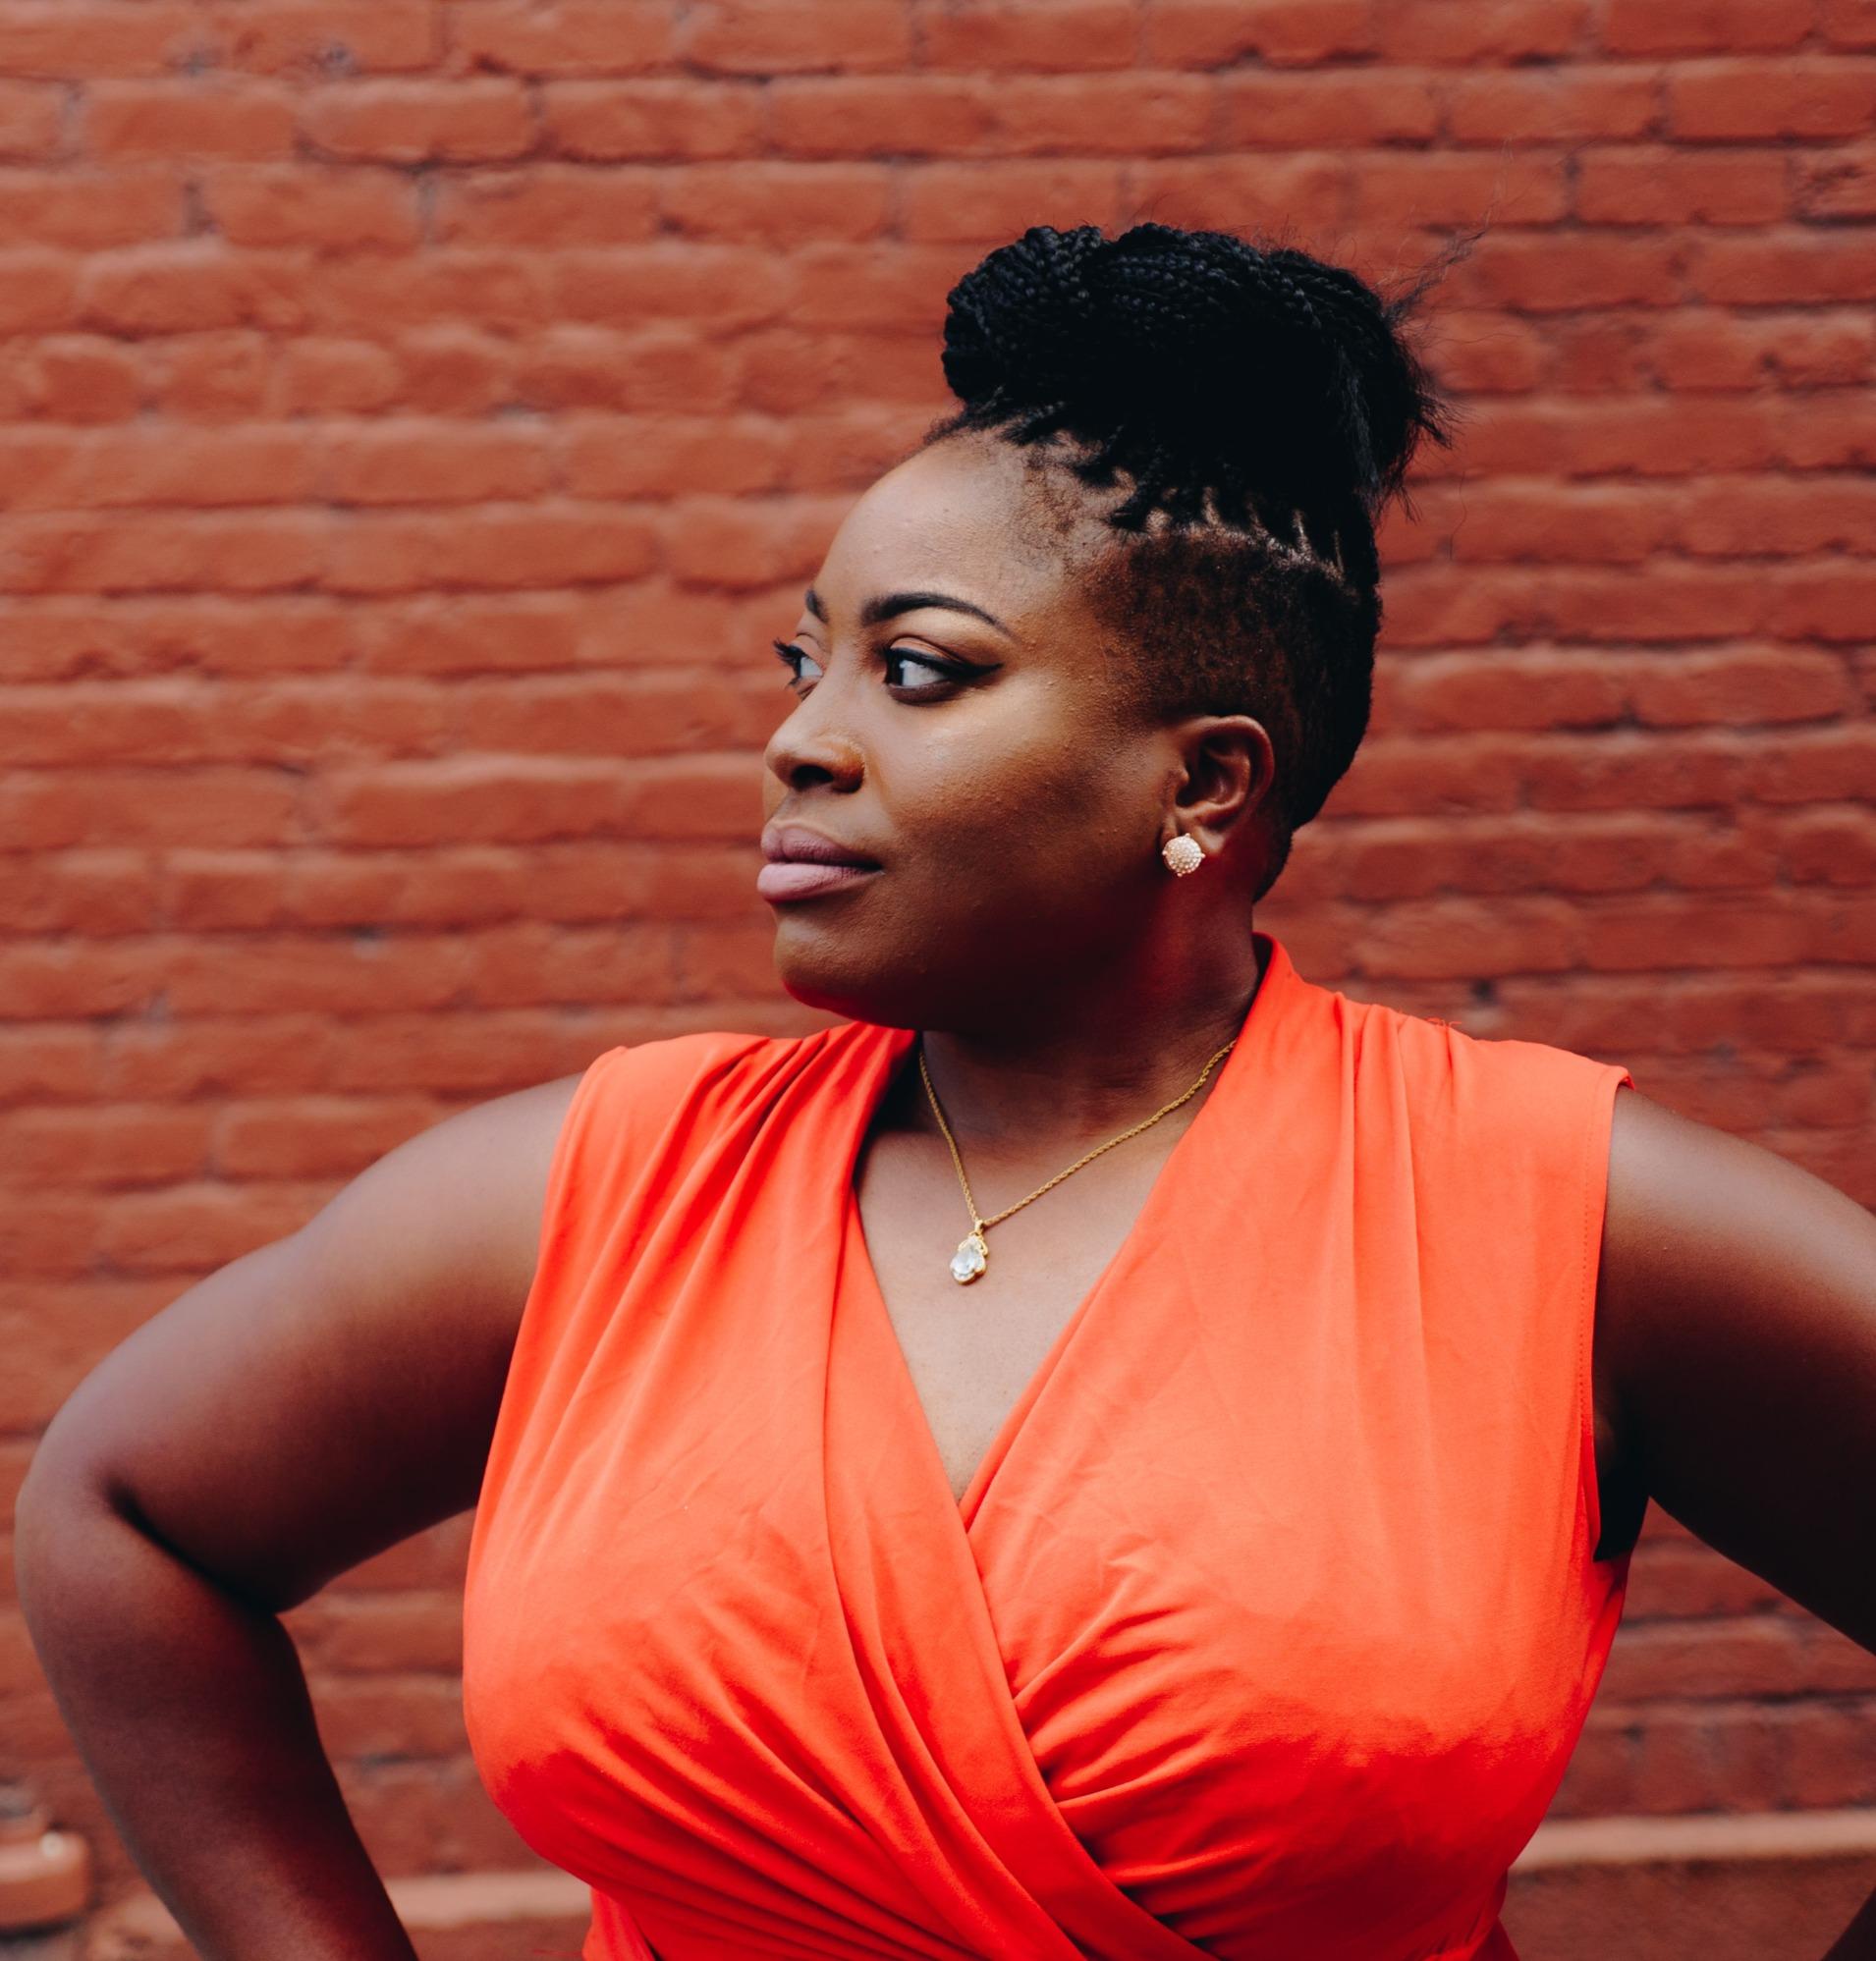 Black lady posing